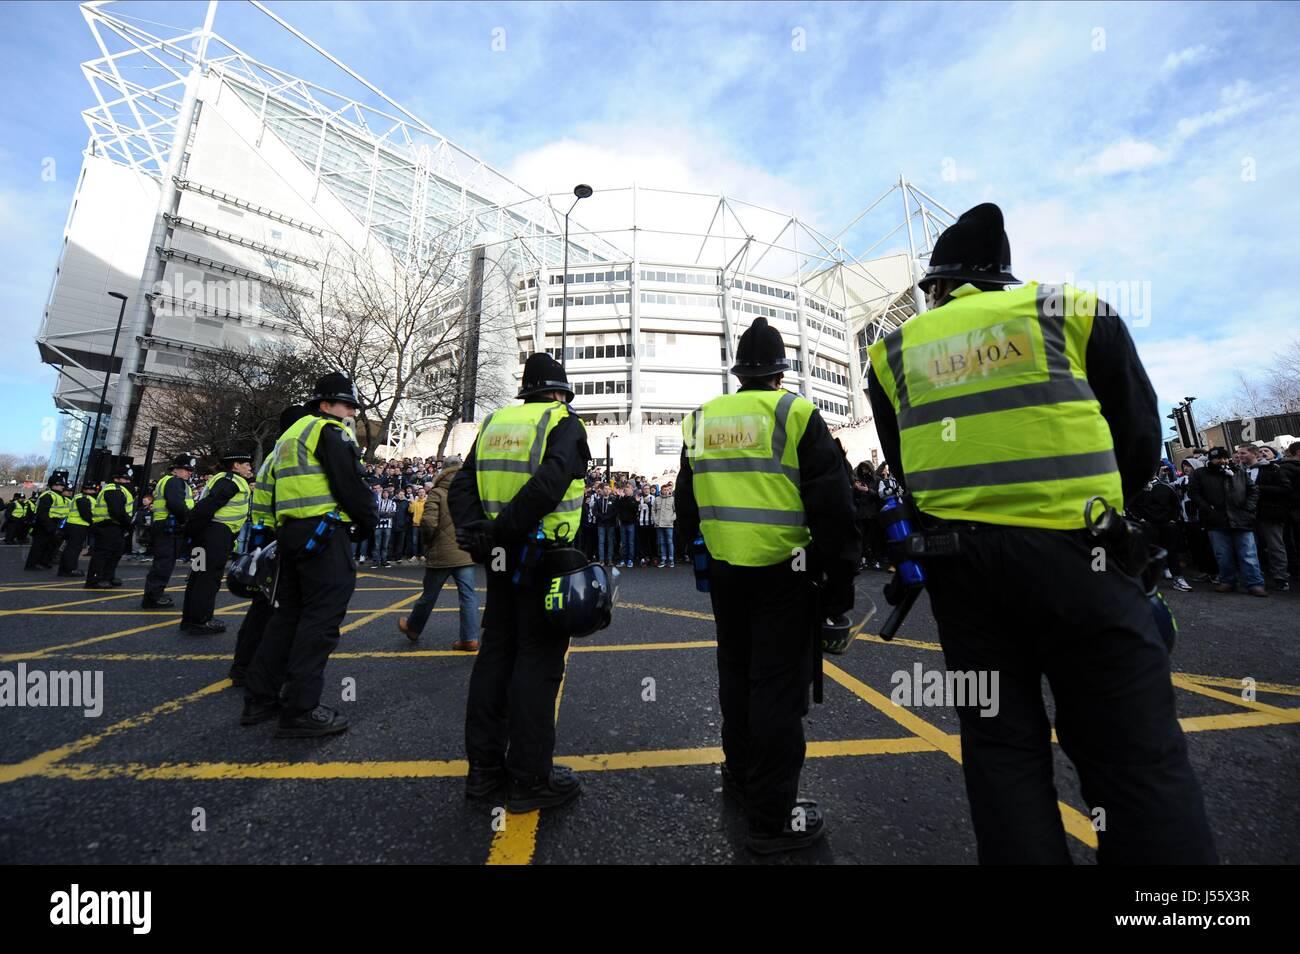 POLICE LINE OUTSIDE ST JAMES P NEWCASTLE FC V SUNDERLAND FC ST JAMES PARK NEWCASTLE ENGLAND 01 February 2014 - Stock Image